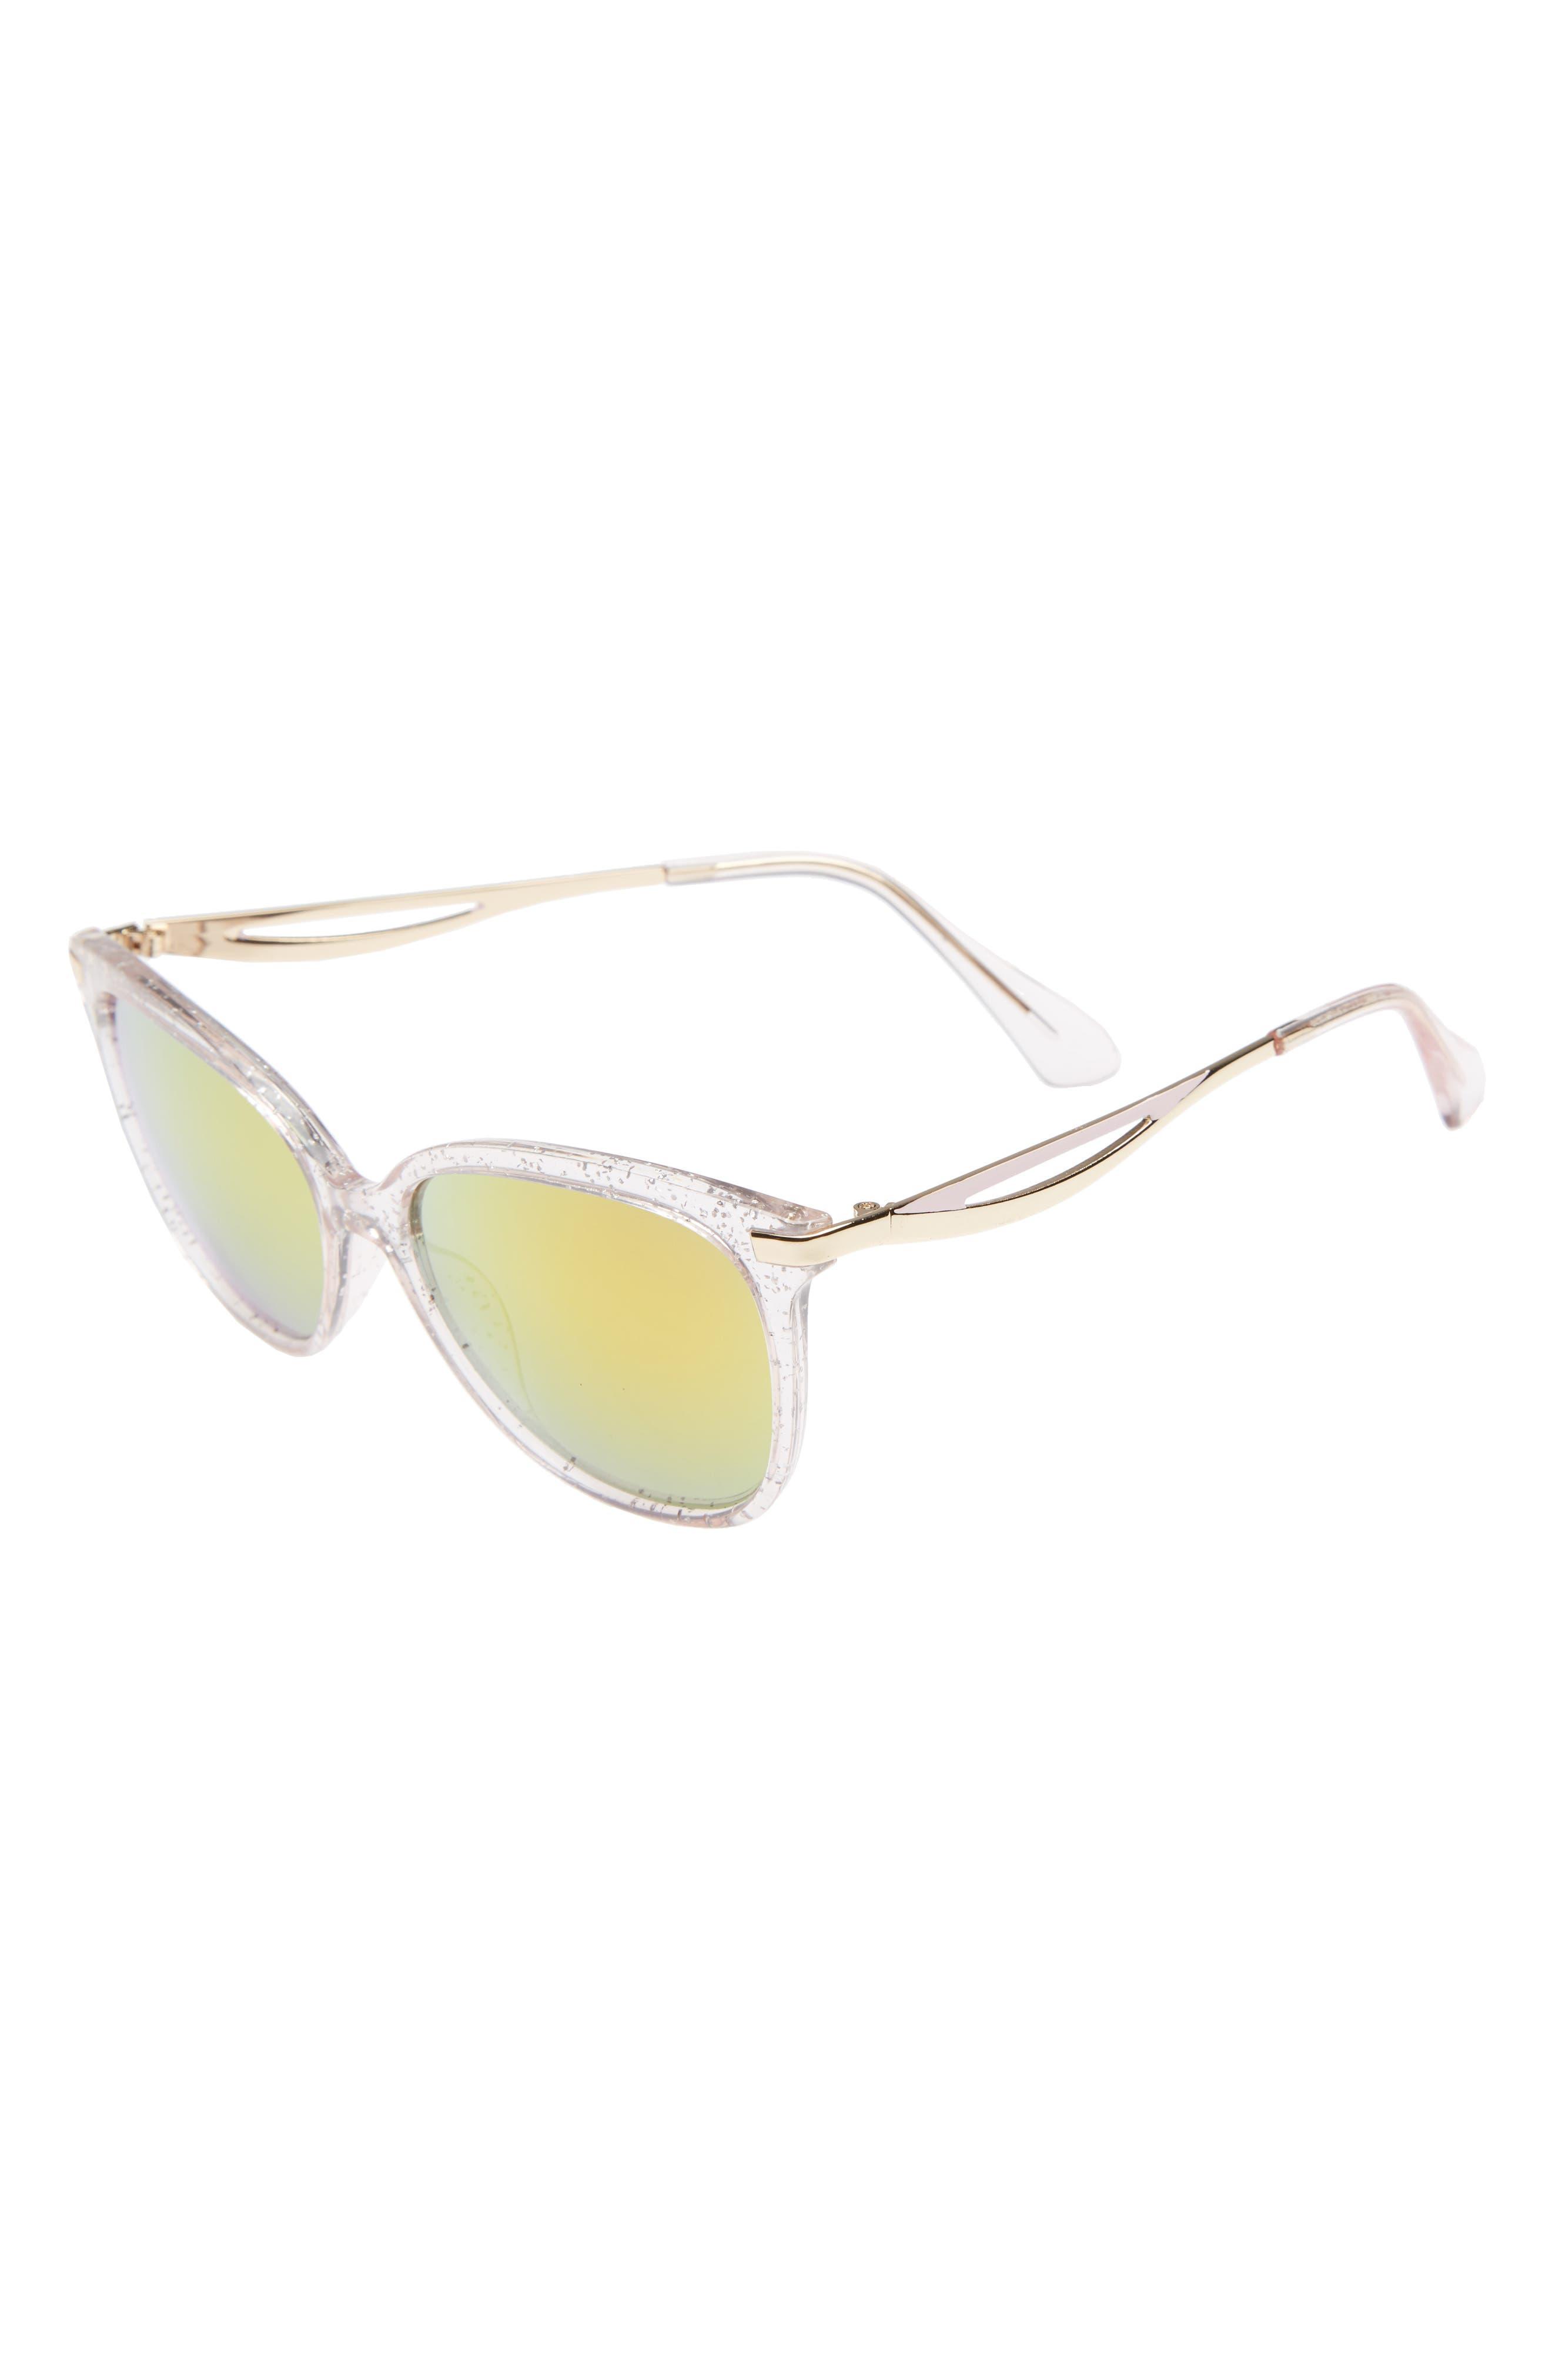 Fantas Eyes Sadie 45mm Glitter Sunglasses (Kids)